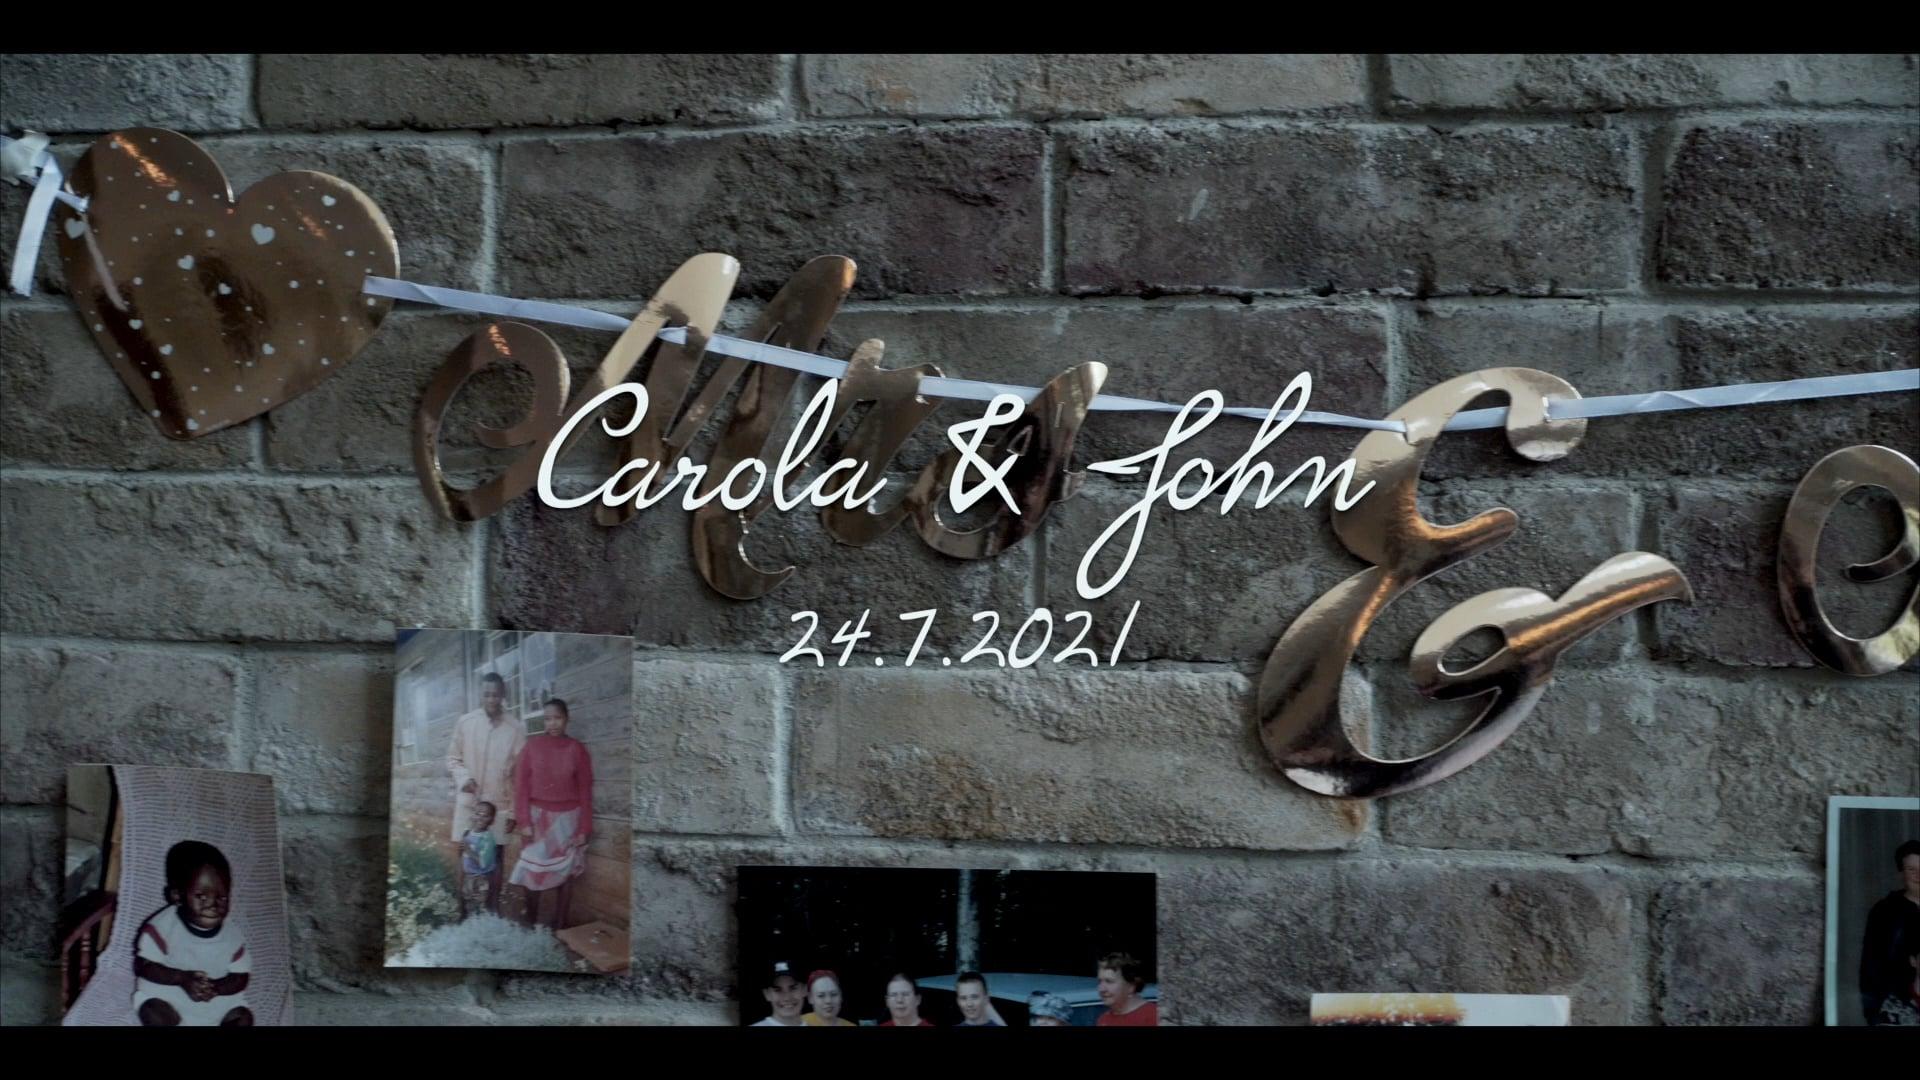 Carola & John 24.7.2021